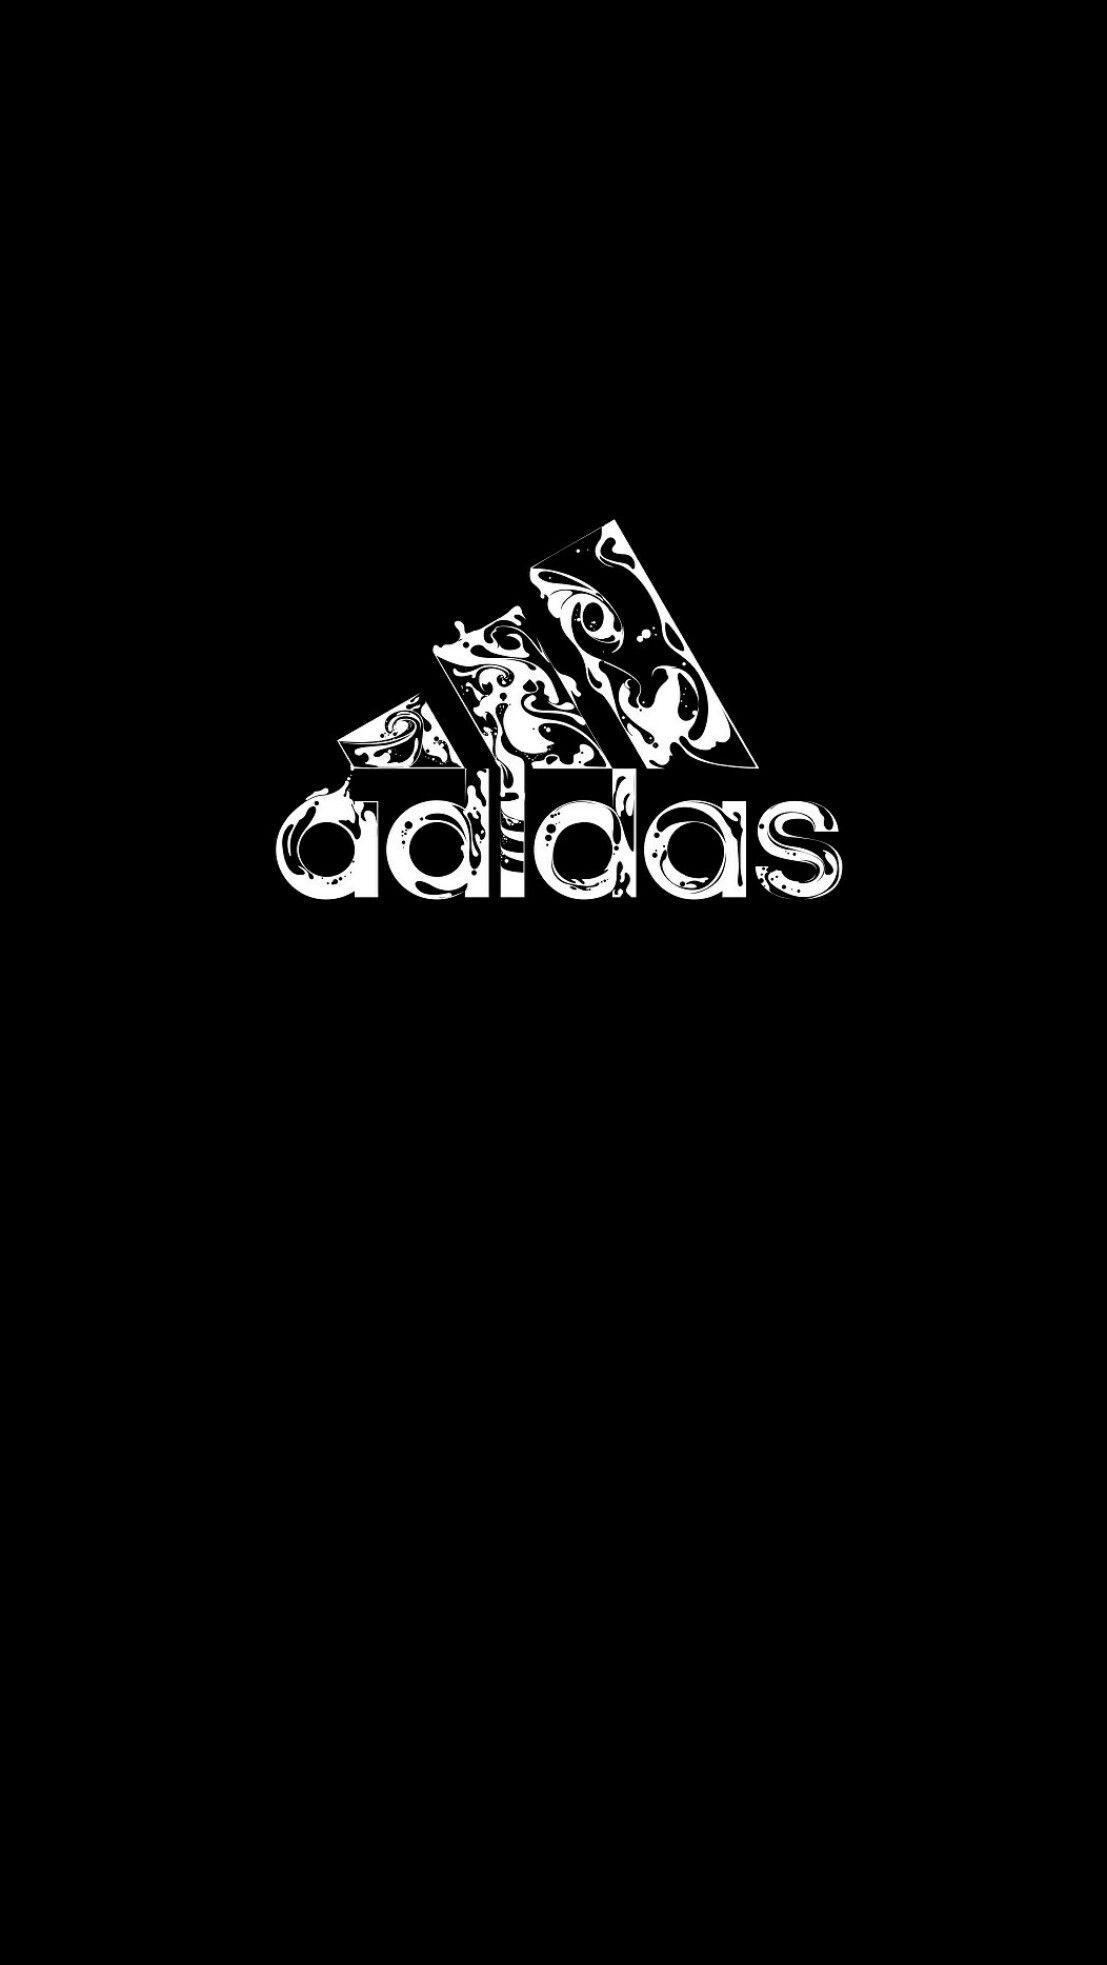 Black Adidas Logo Wallpapers Top Free Black Adidas Logo Backgrounds Wallpaperaccess